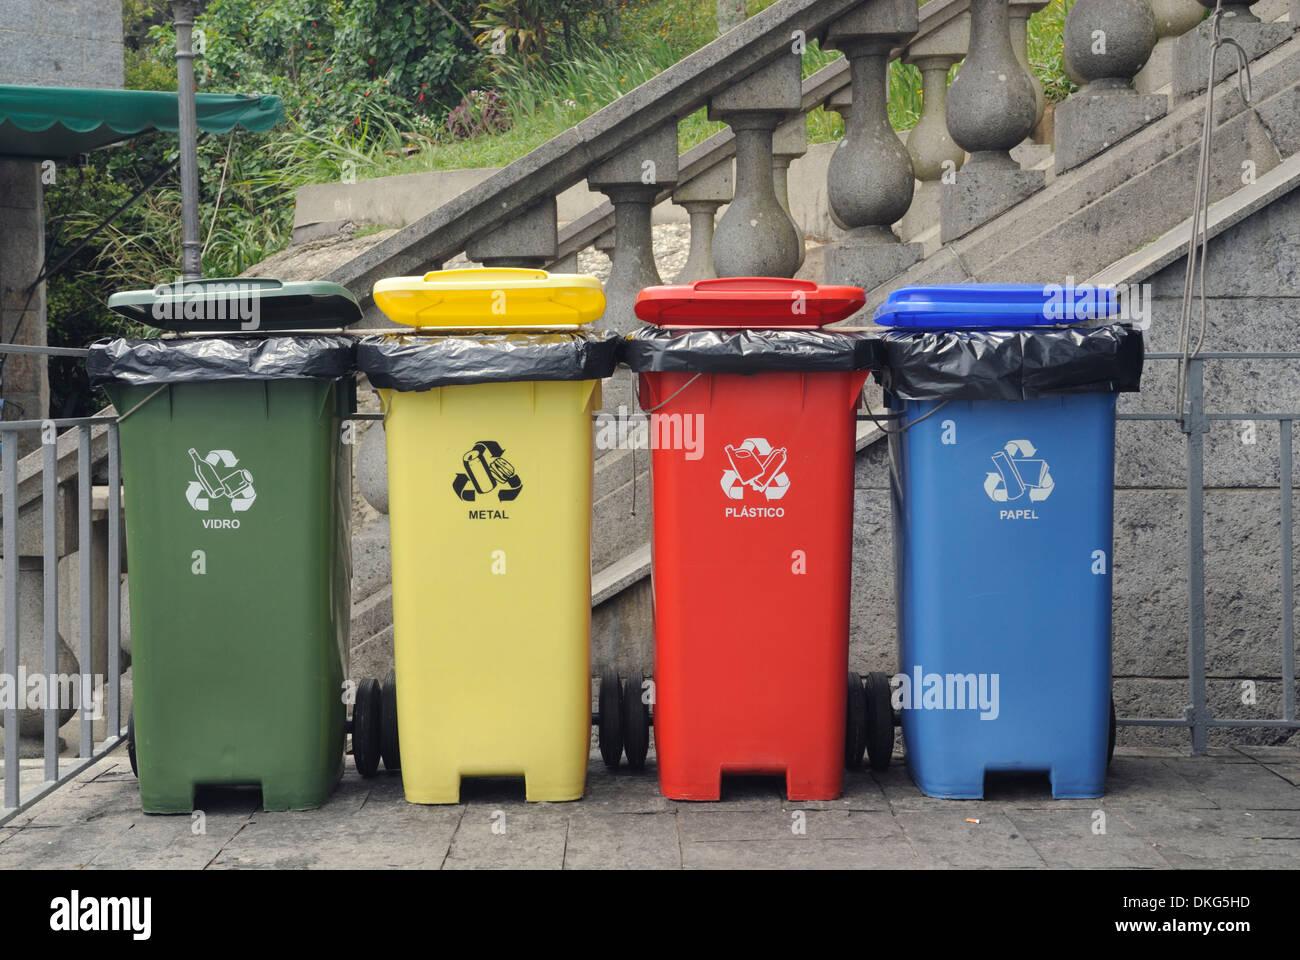 Rio de Janeiro, Brazil. Four coloured waste bins lined up: glass, paper, plastics and metal. - Stock Image